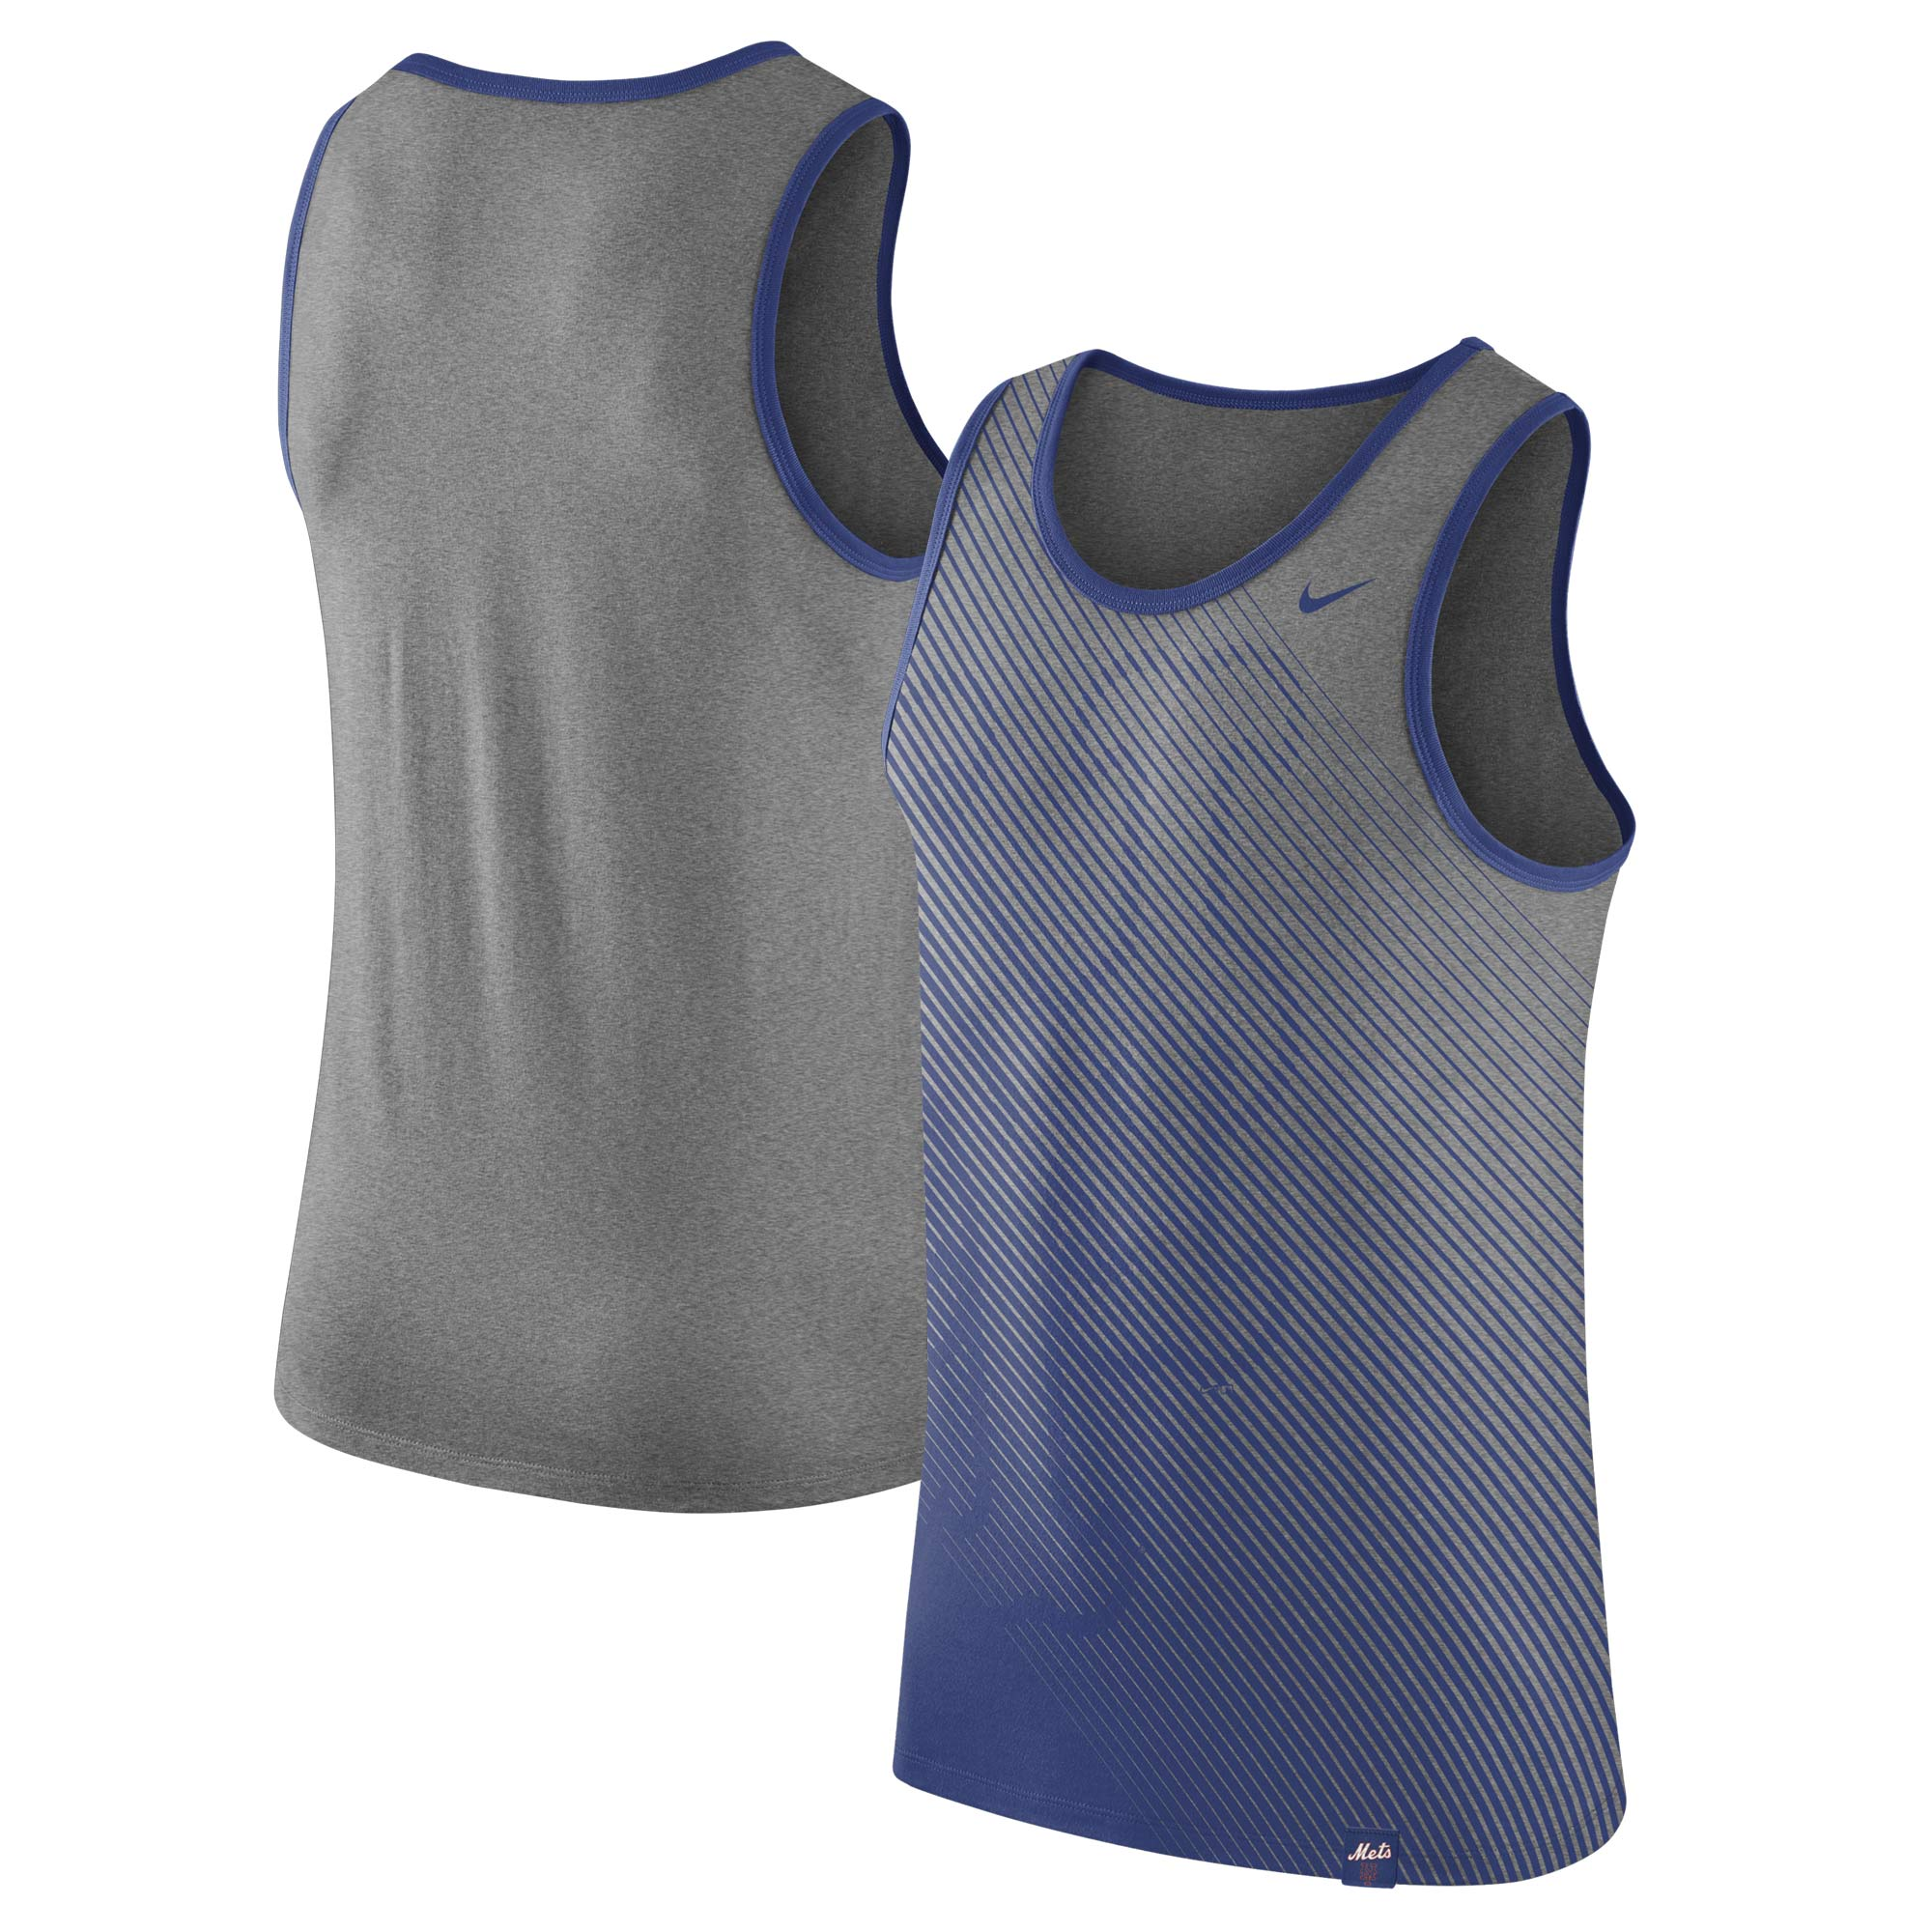 New York Mets Nike 1.7 Tri-Blend Tank Top - Heathered Gray